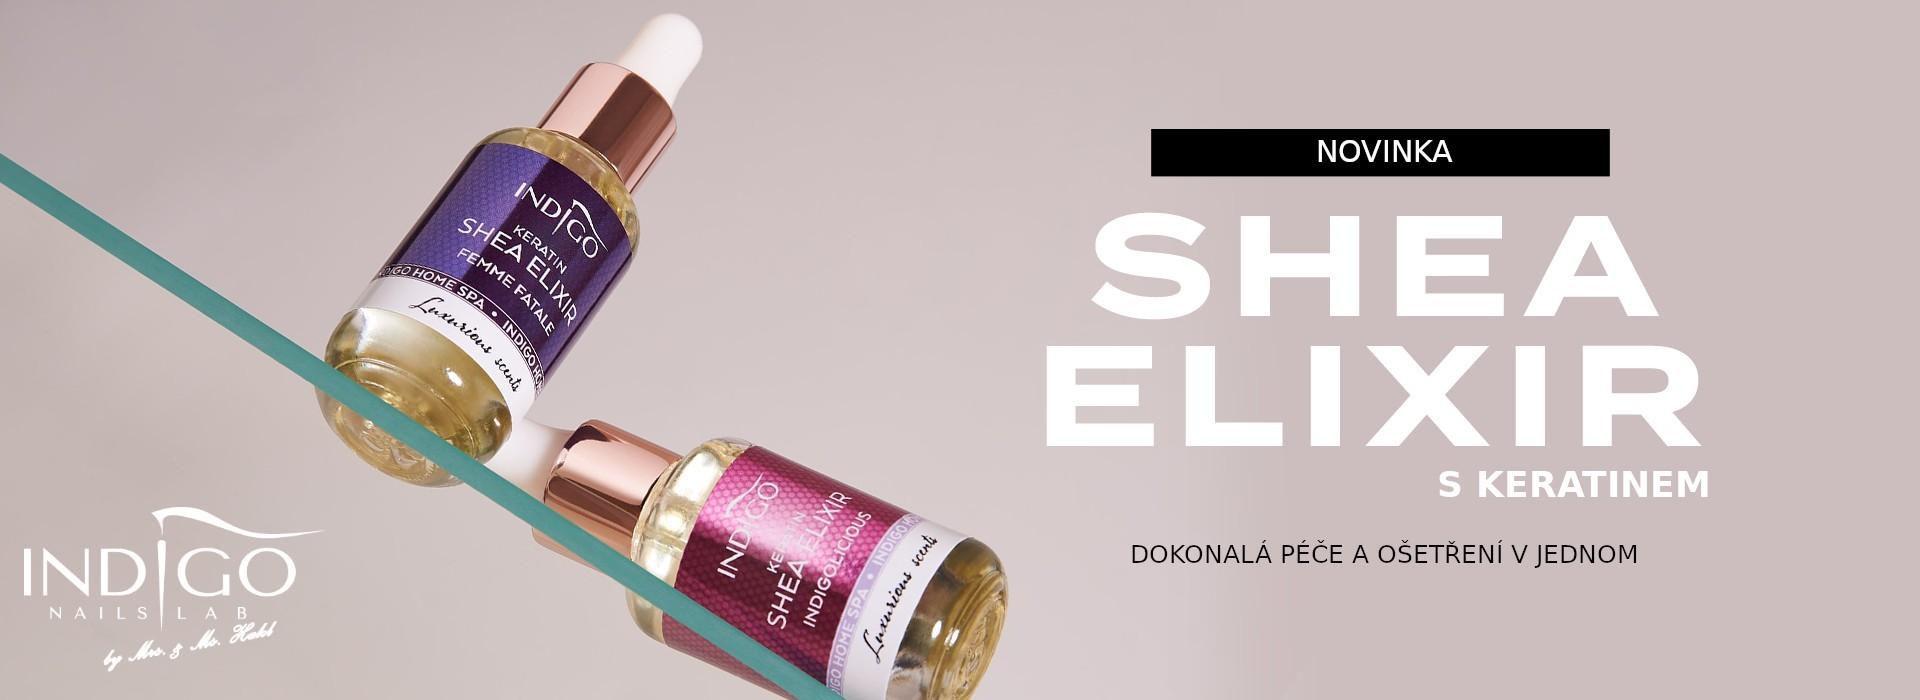 Shea Elixir